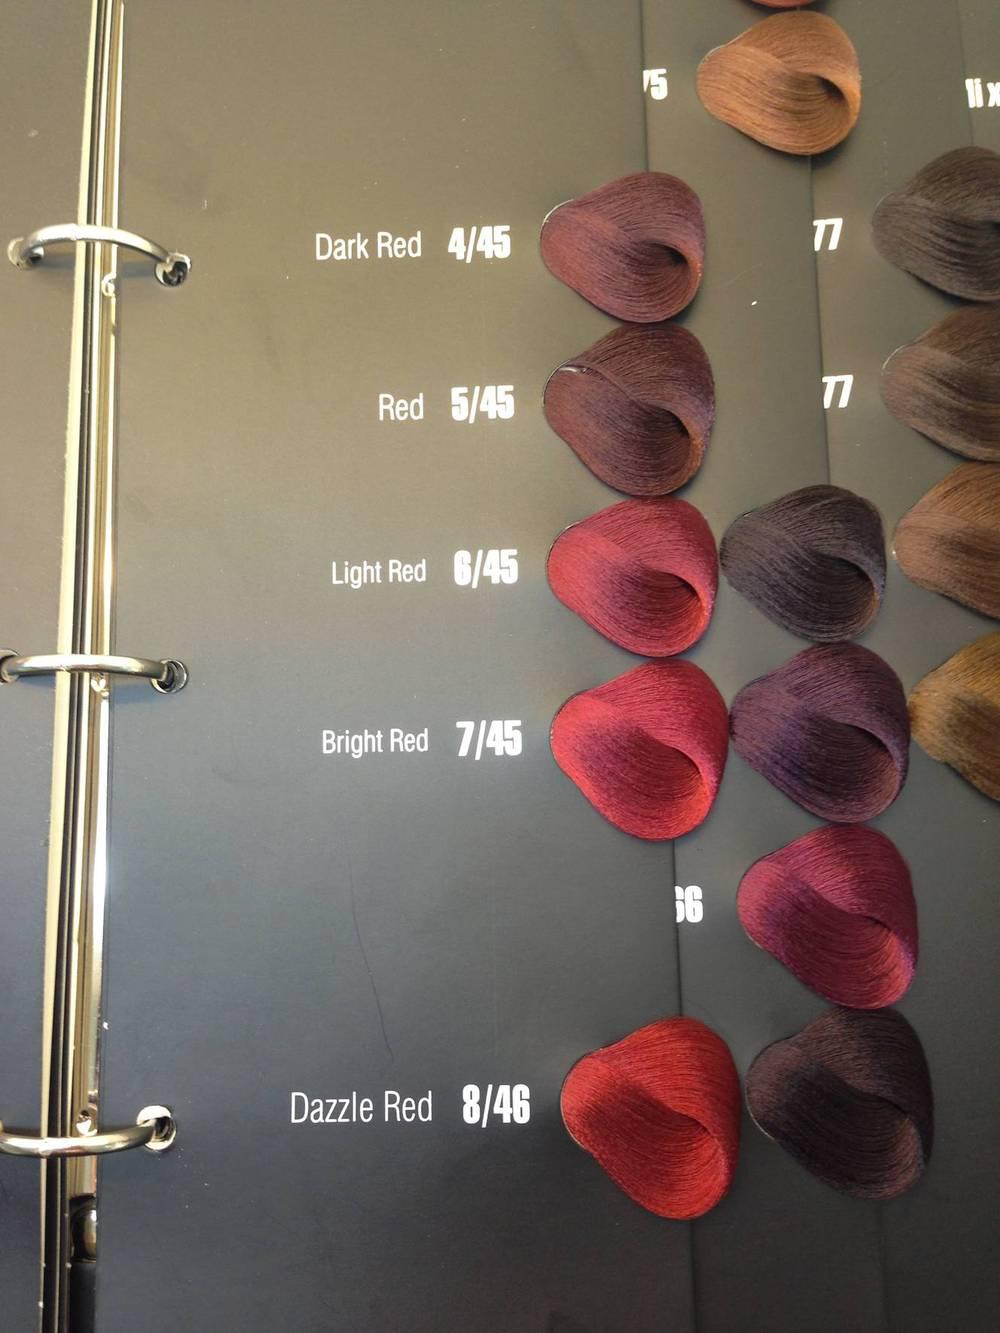 Oem hair color swatch book salon hair color chart view hair color oem hair color swatch book salon hair color chart nvjuhfo Image collections